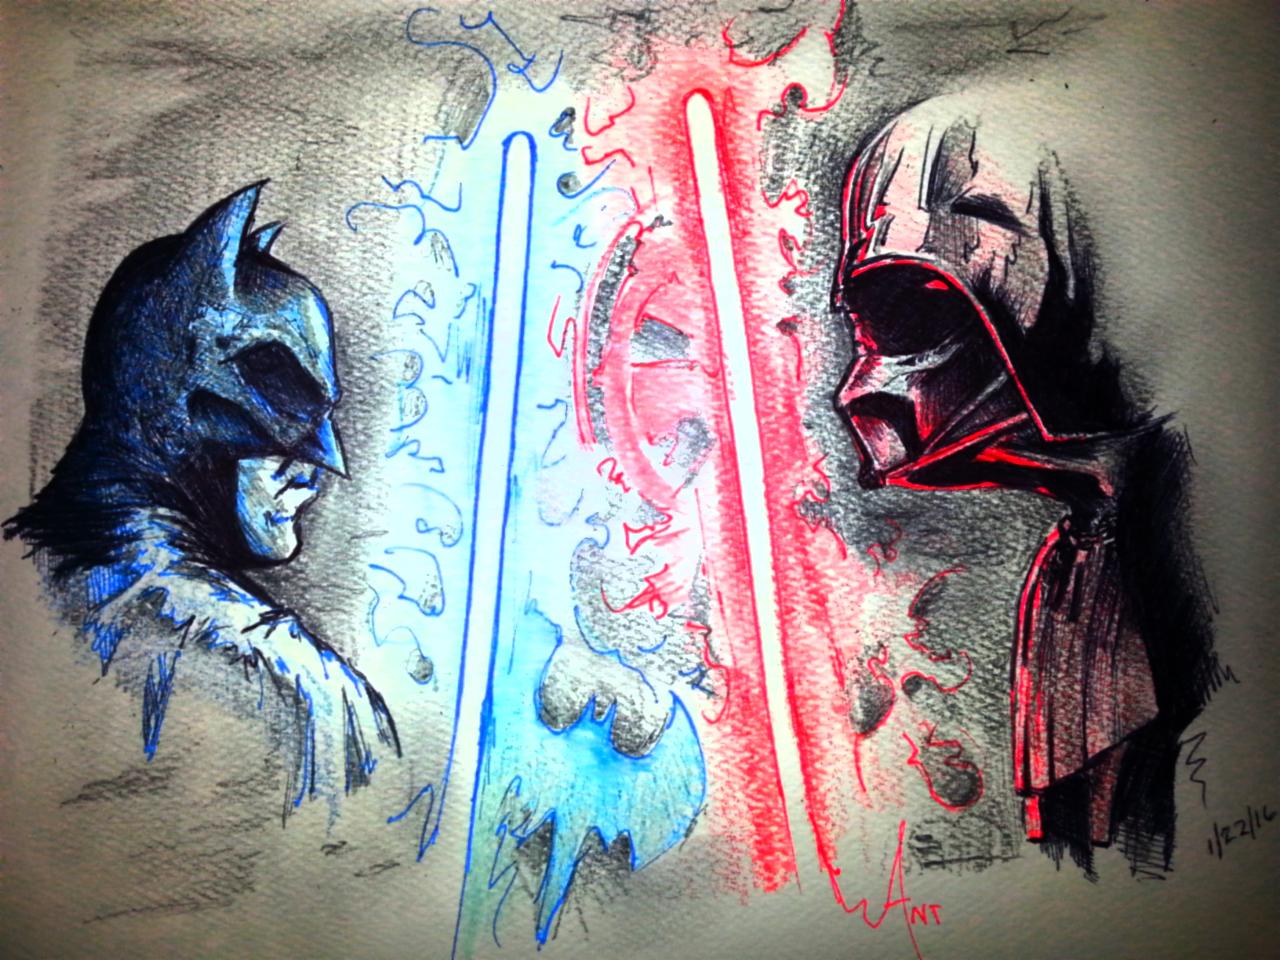 Batsvader